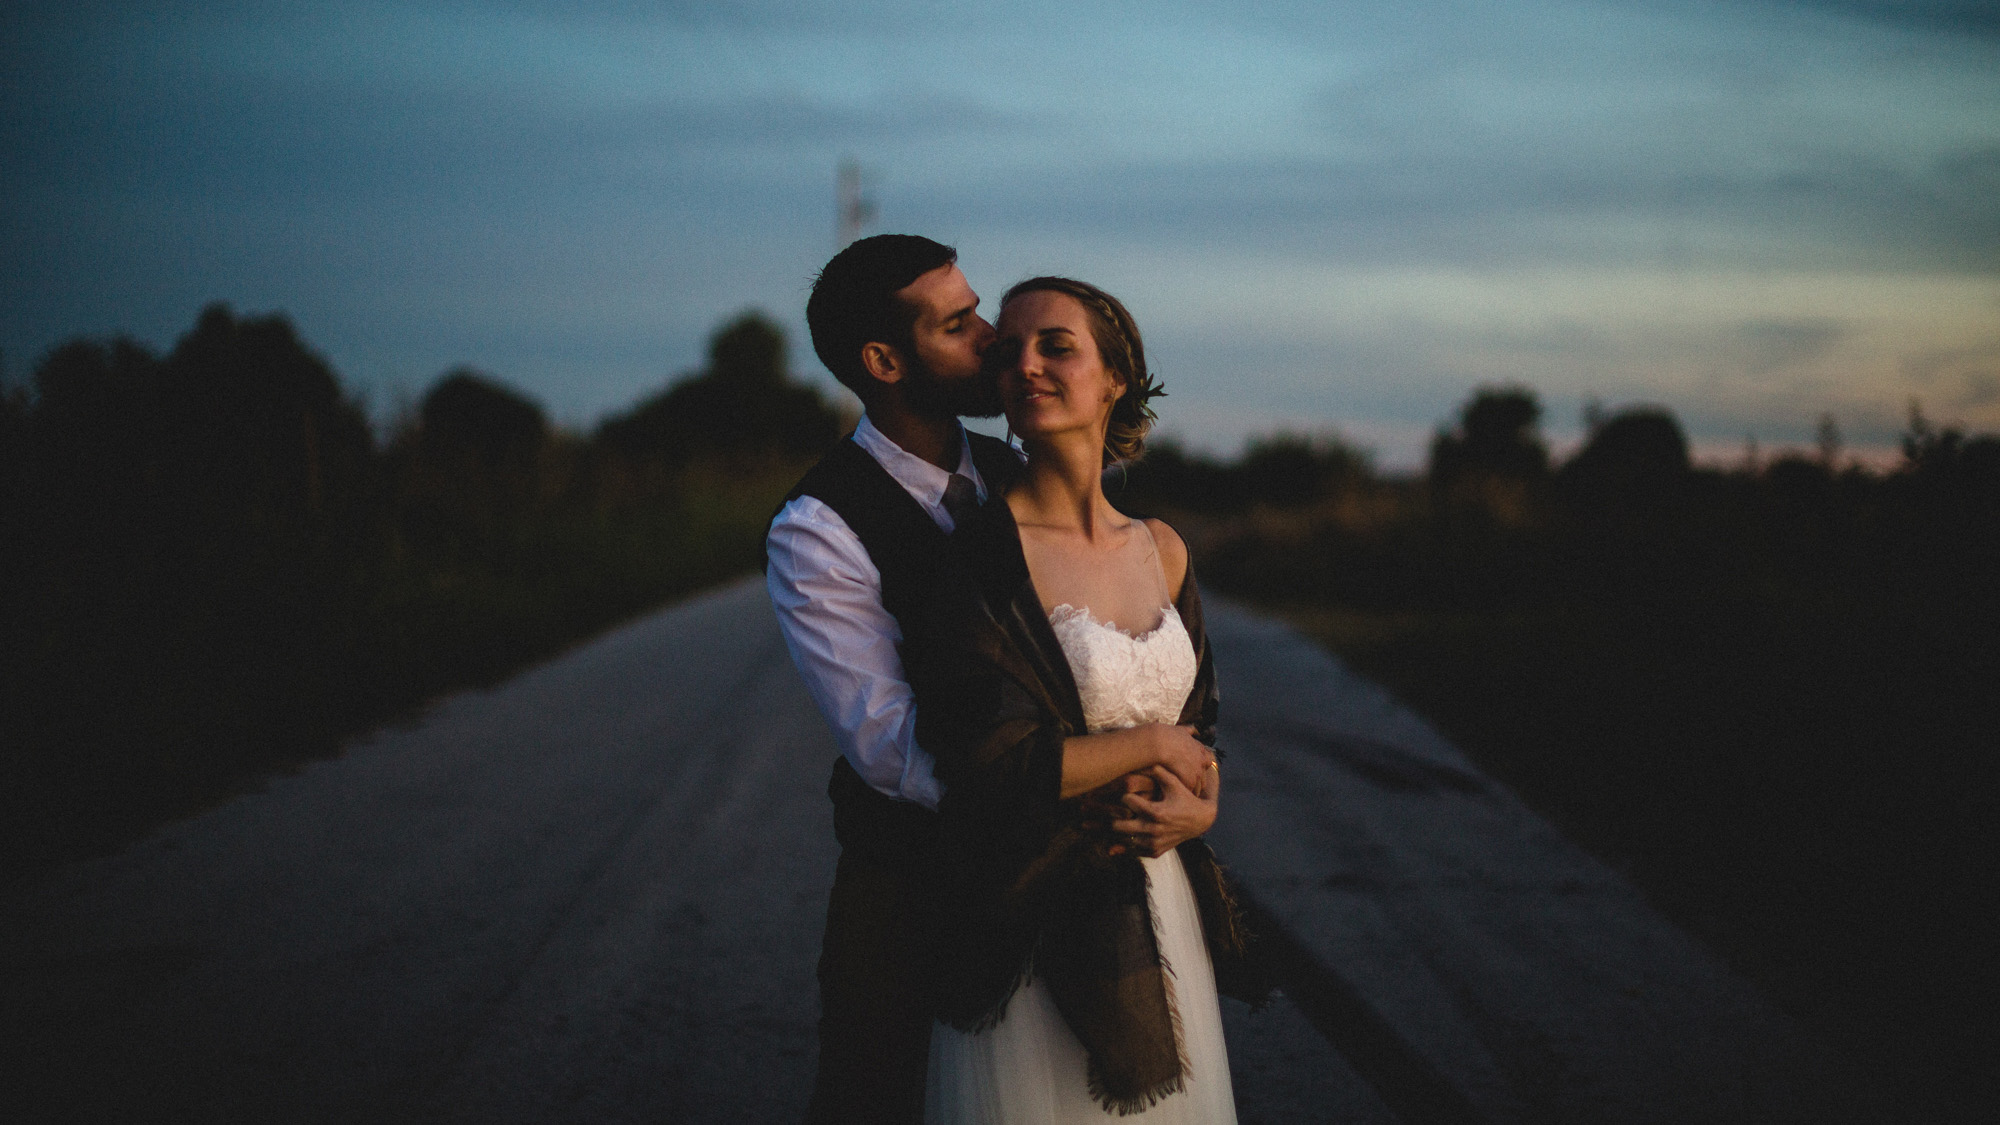 alec_vanderboom_springfield_missouri_wedding-0081.jpg